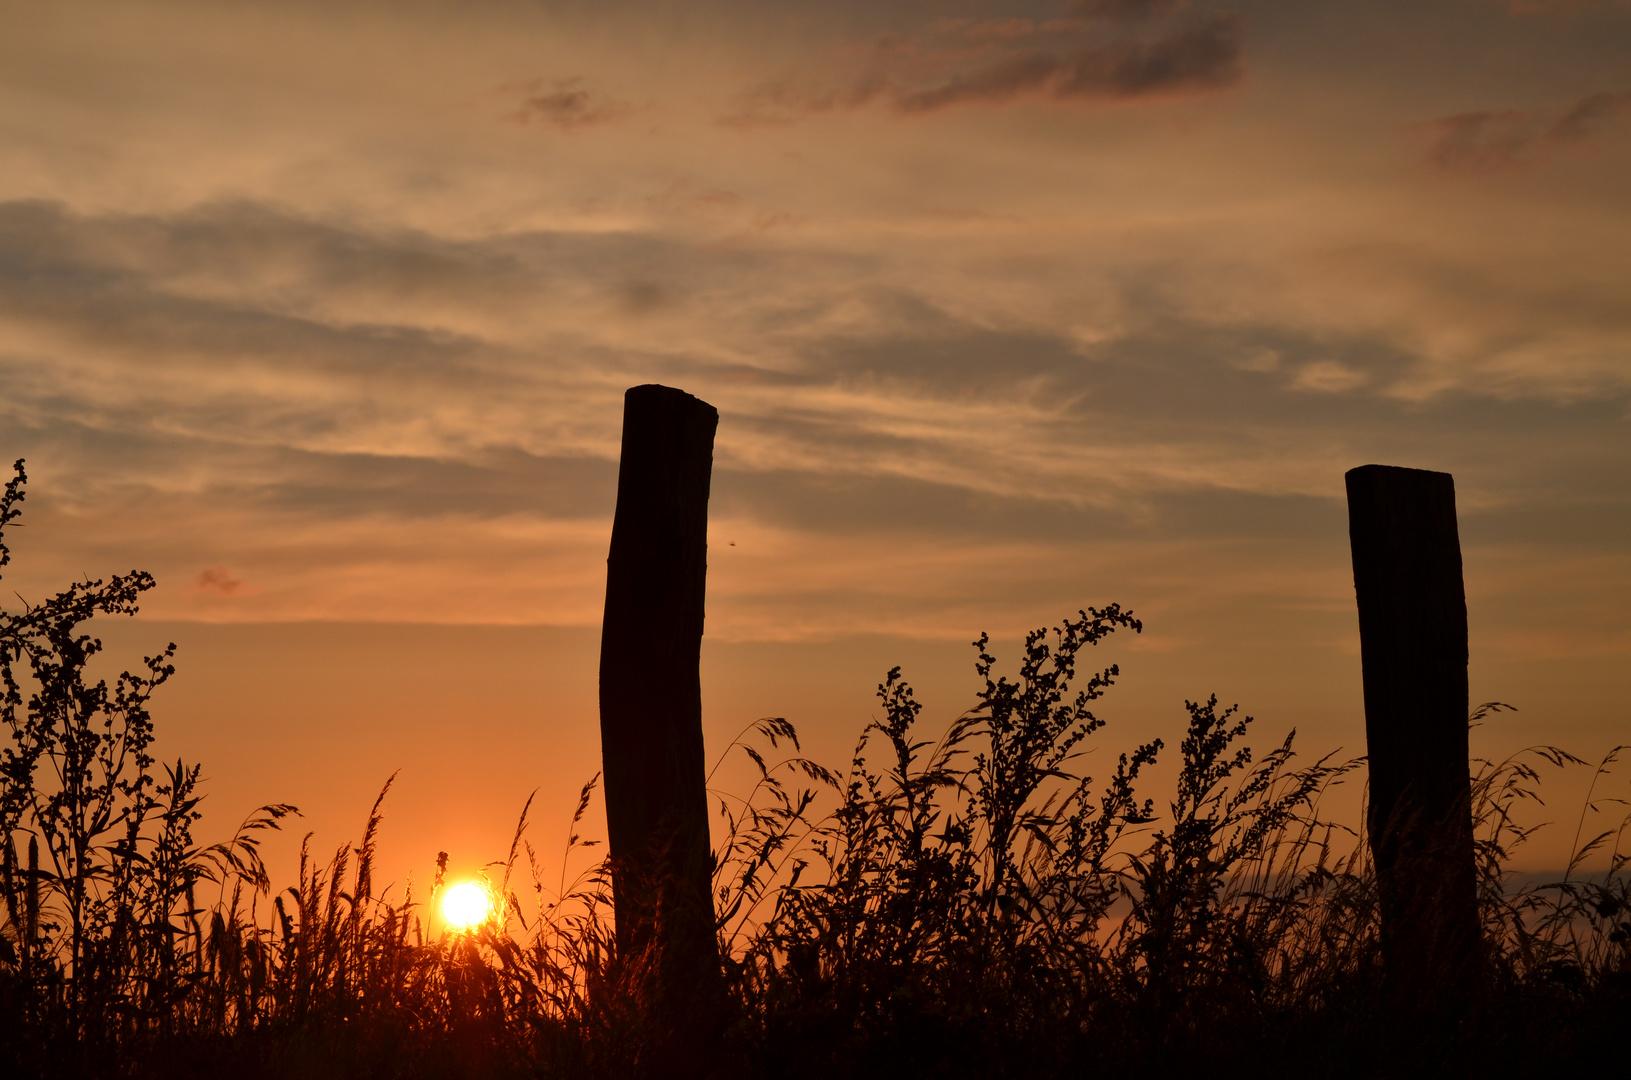 Sonnenuntergang hinter Feld und Pfosten